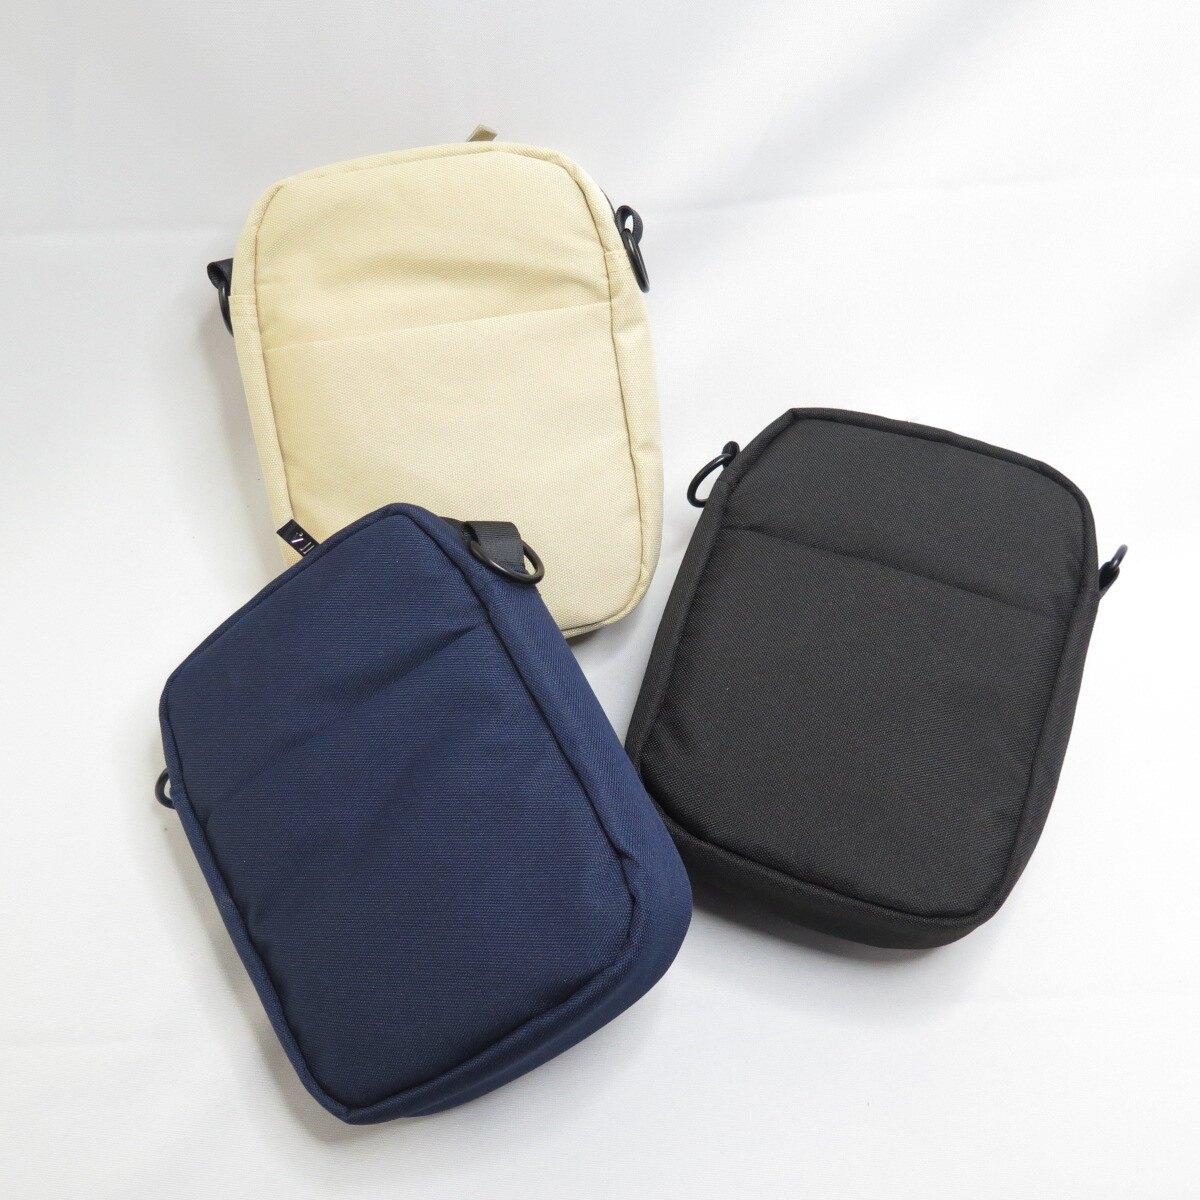 FILA 潮流休閒側背方包 斜跨包 三色帆布包 BMV3014- 藍/卡其/黑【iSport愛運動】